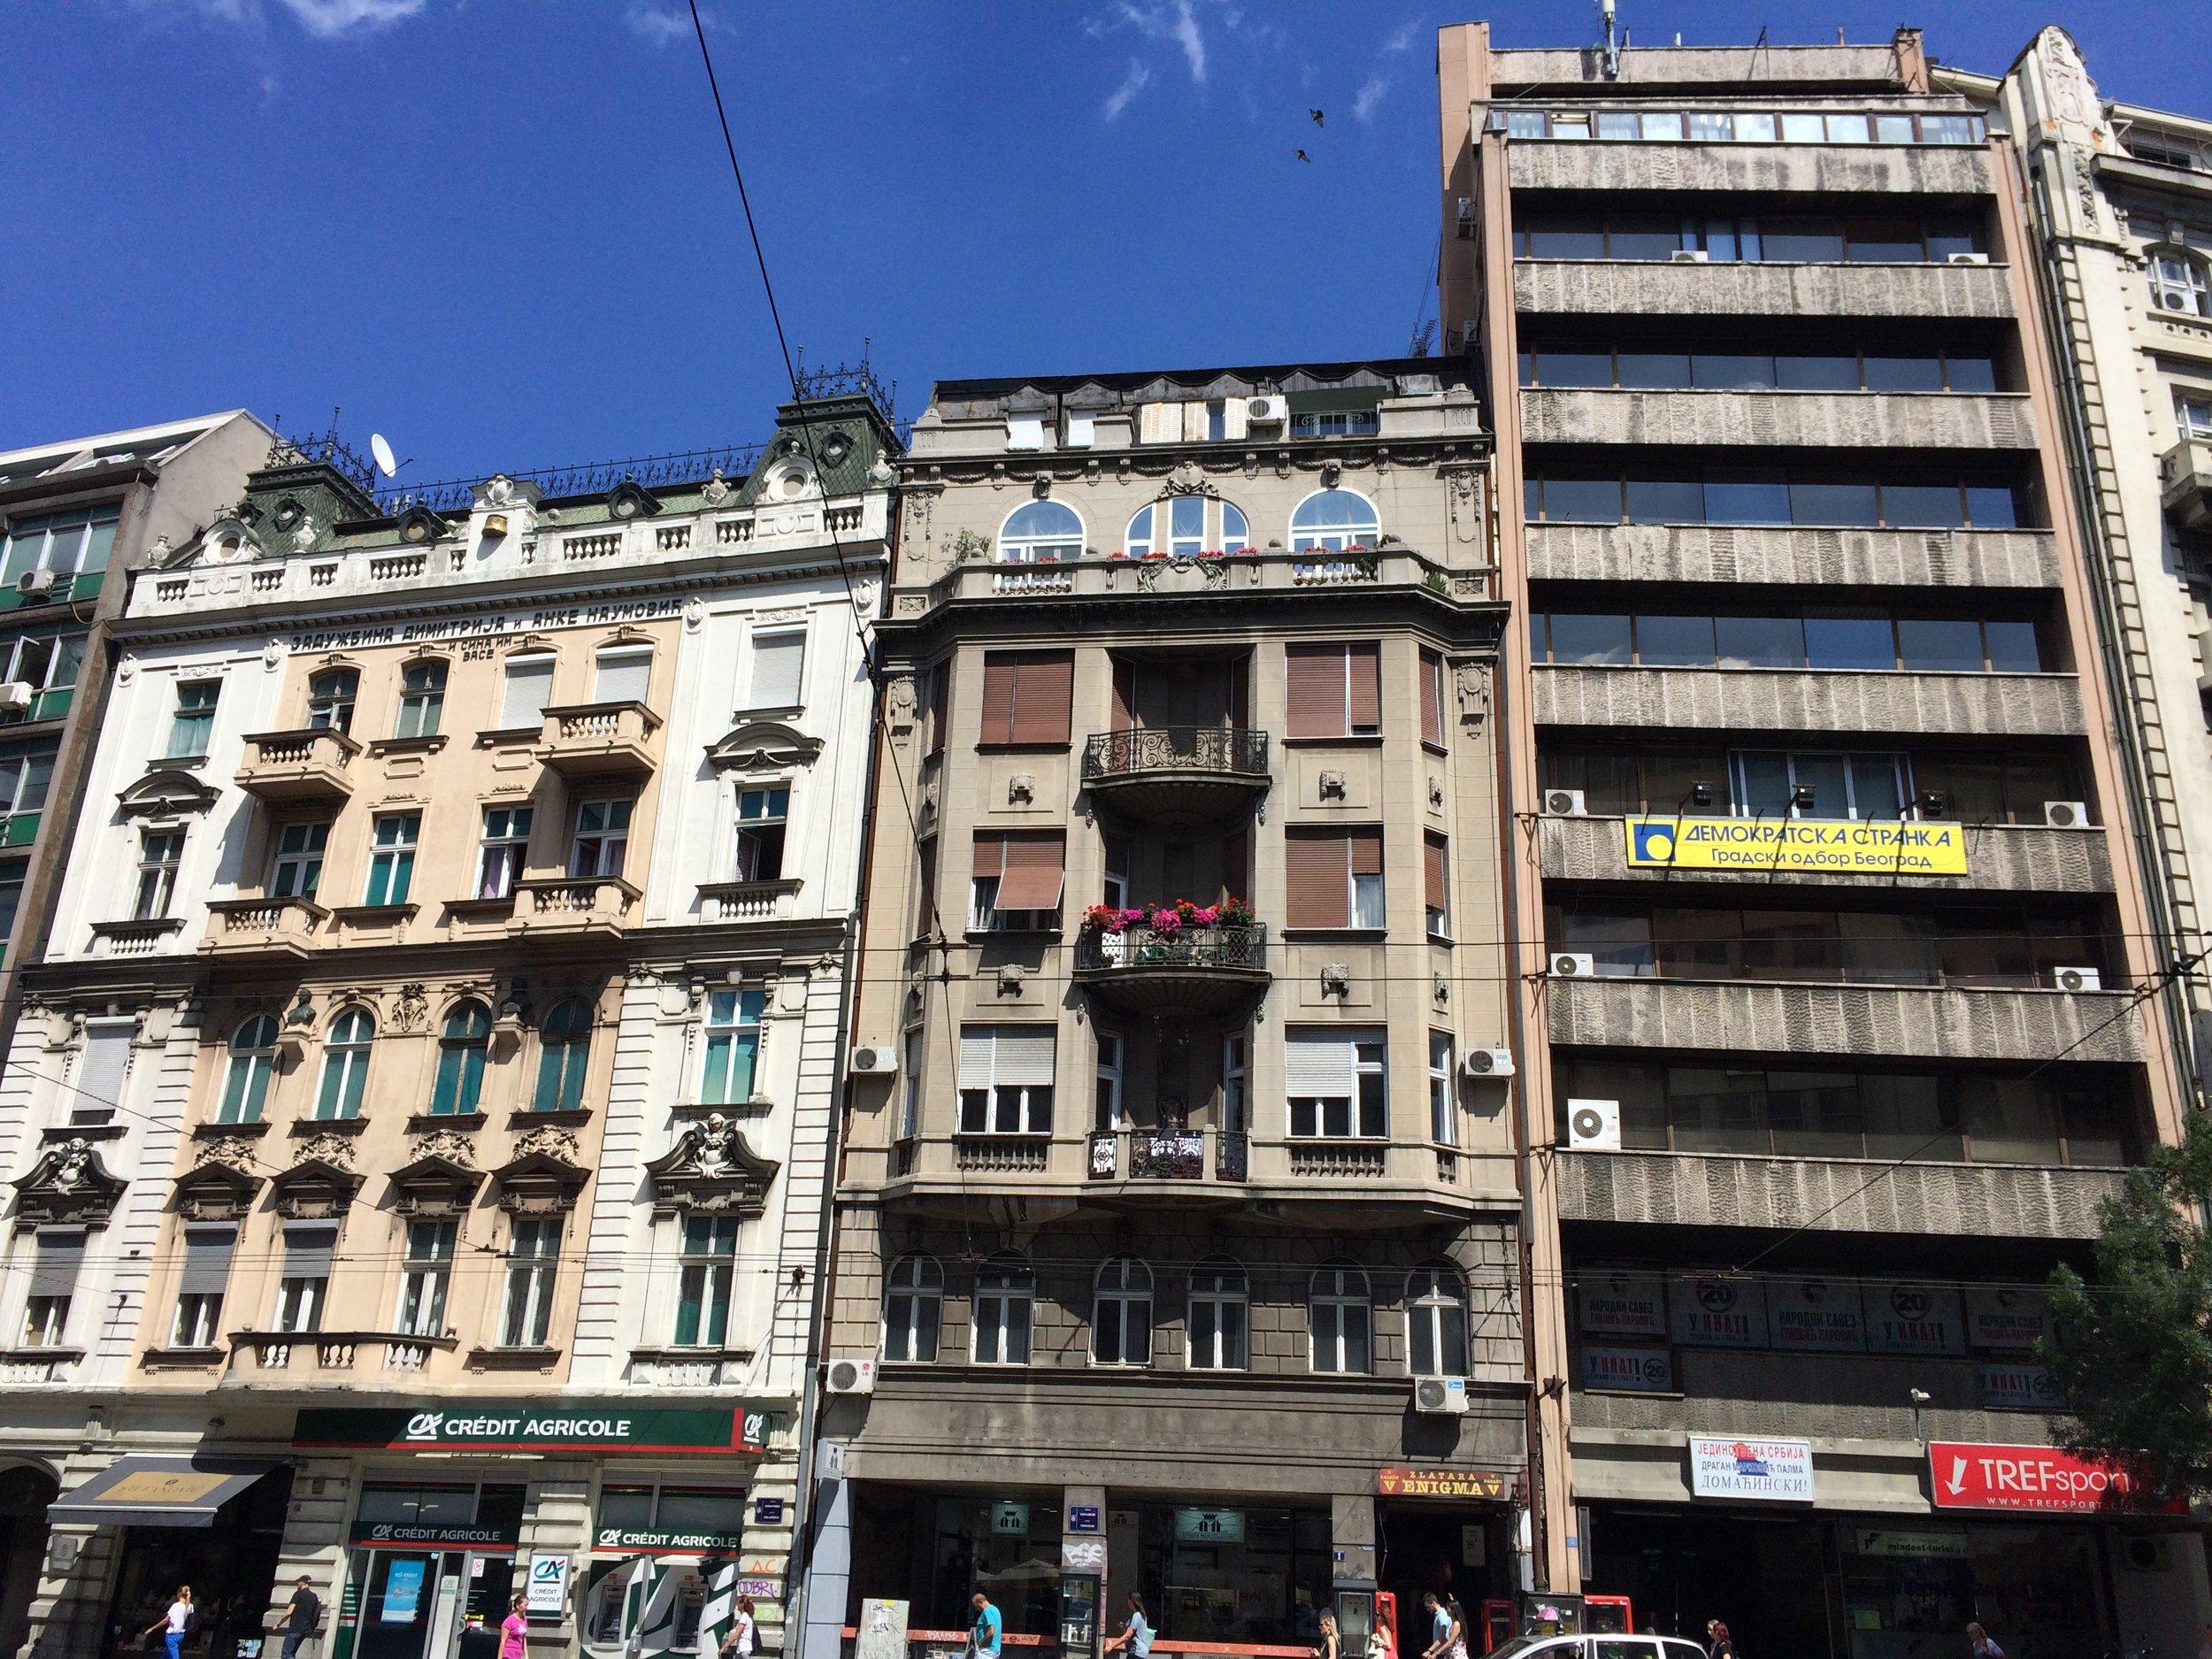 Architectural mash up: Austrian era (left) and Yugoslavian era (right)